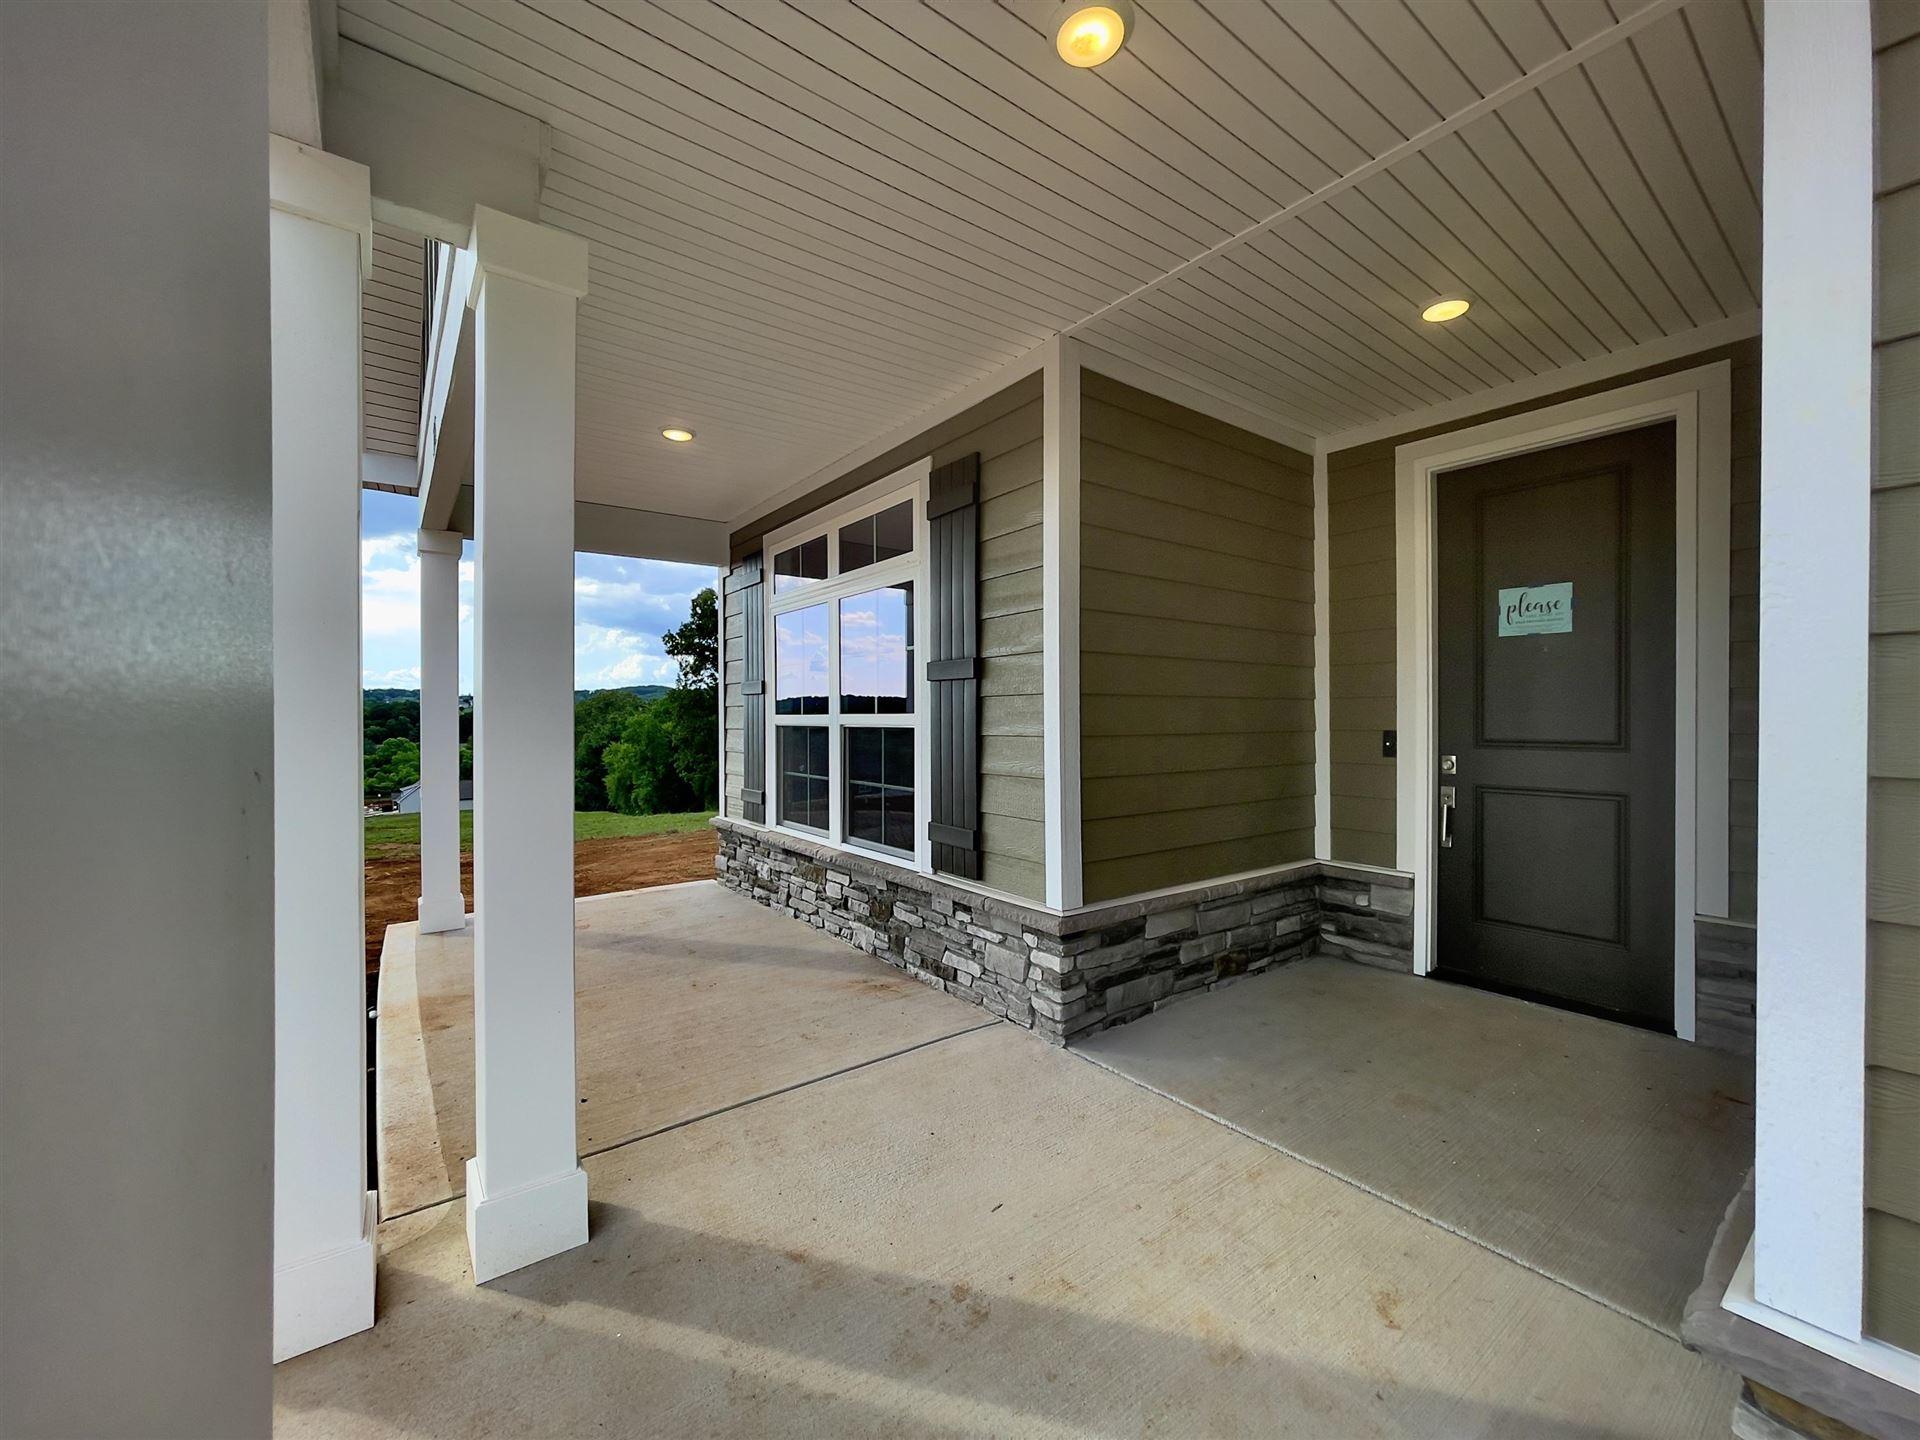 Photo of 209 Cedar branch Tr, Lenoir City, TN 37772 (MLS # 1140761)